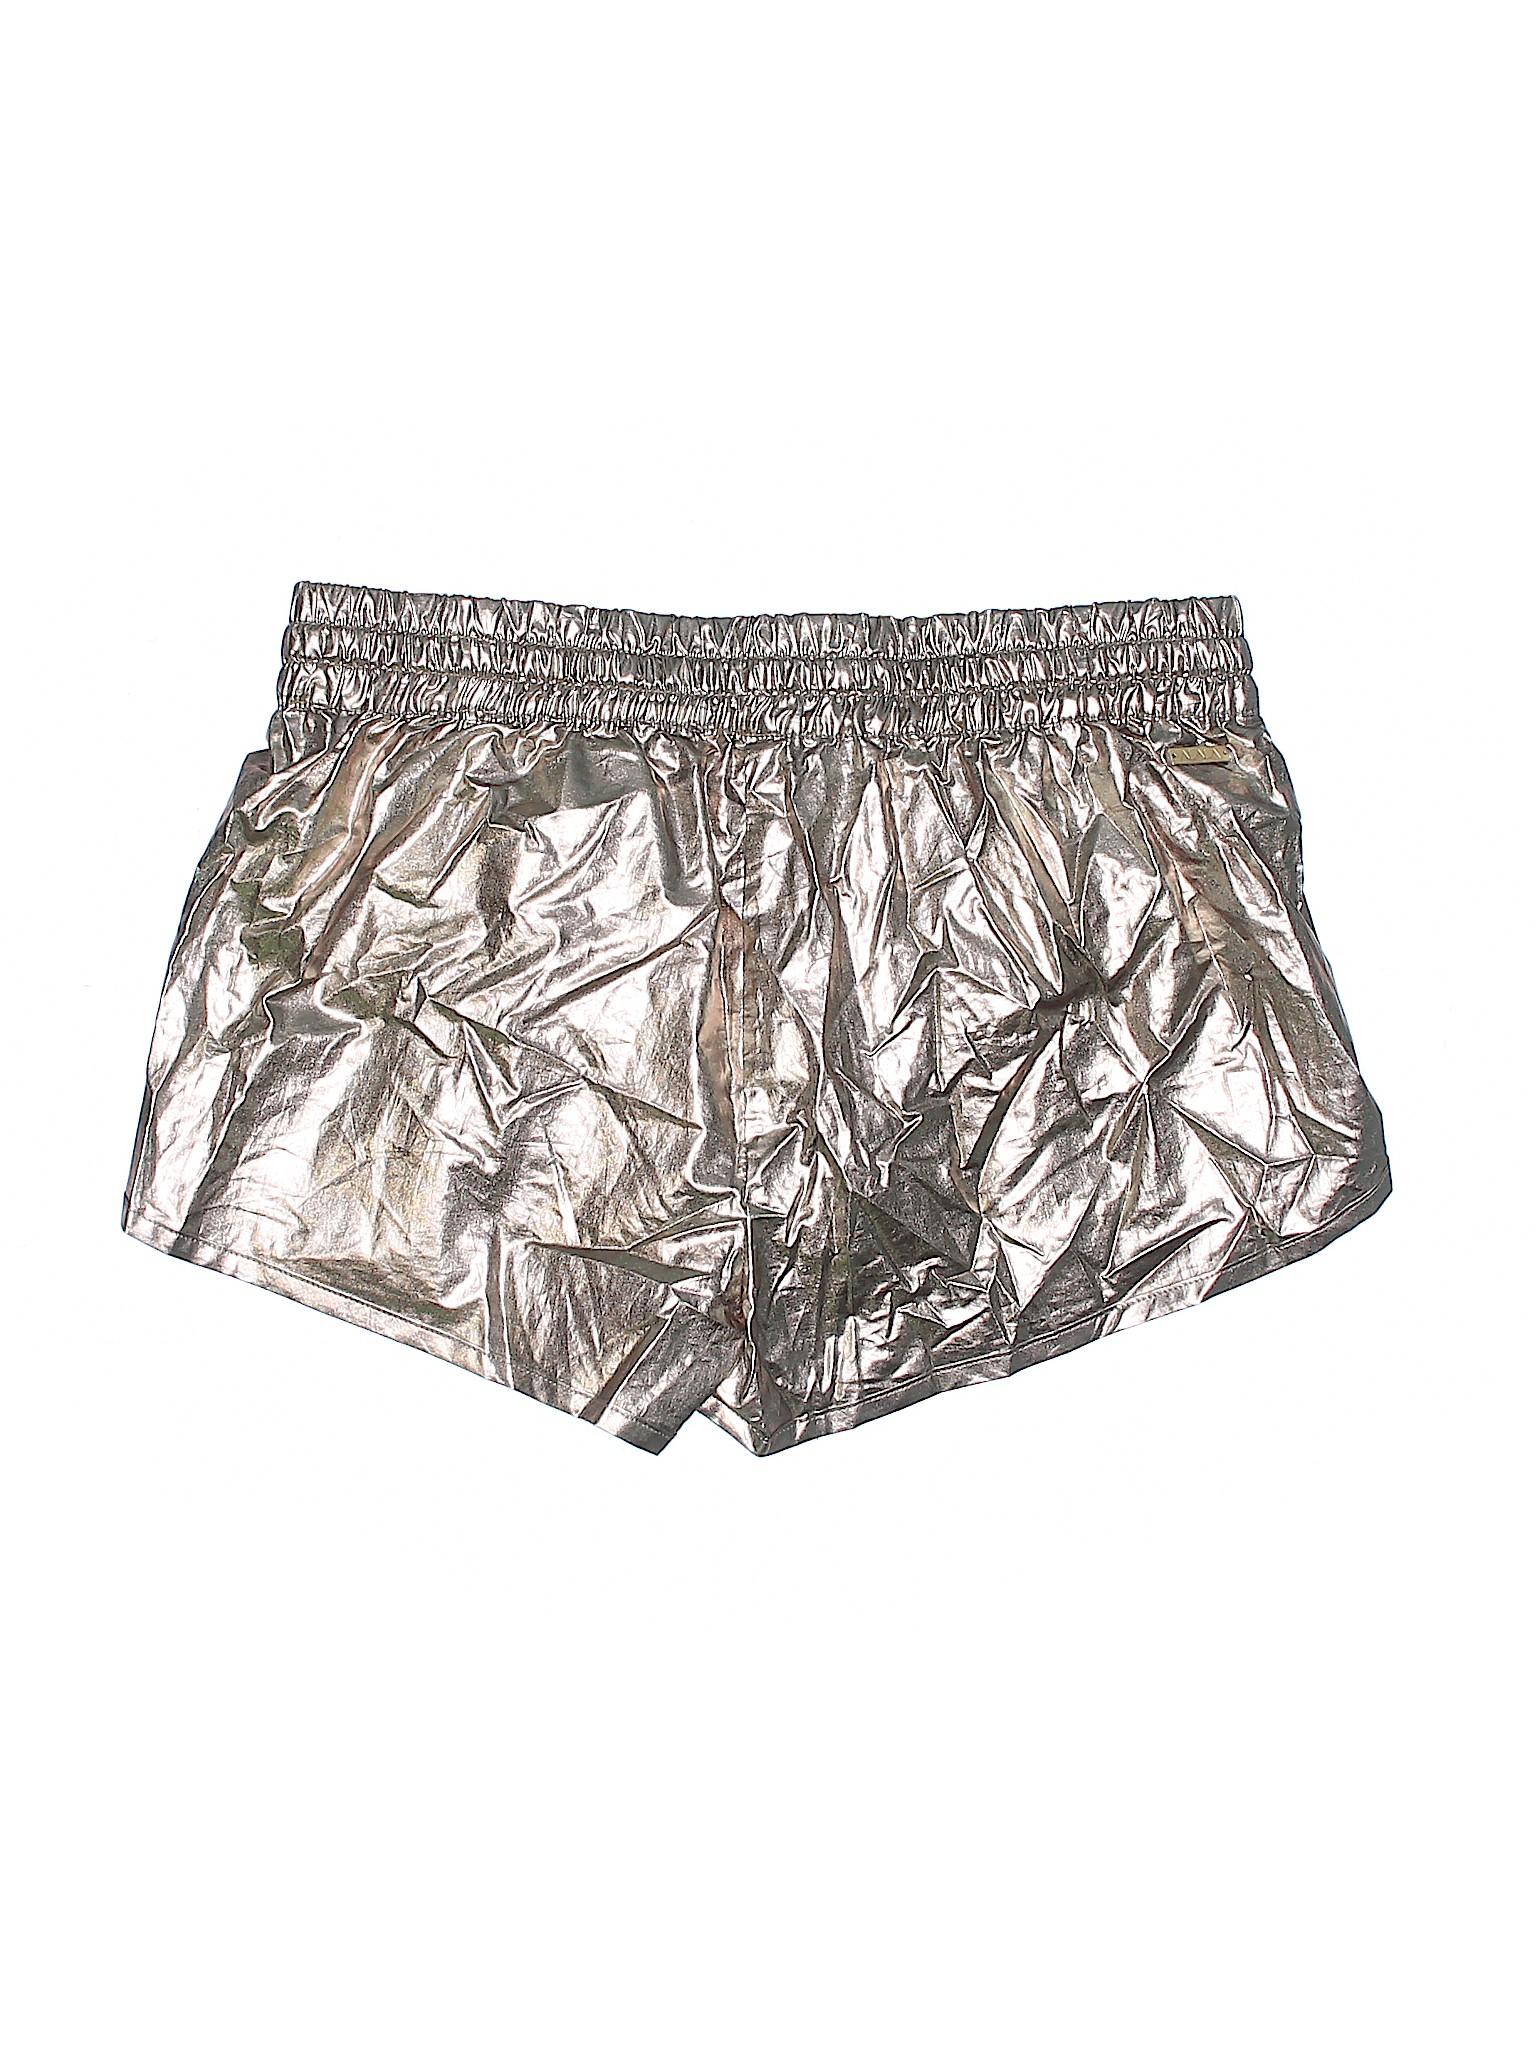 Boutique Shorts Boutique Shorts Alala Alala Boutique TRqw6